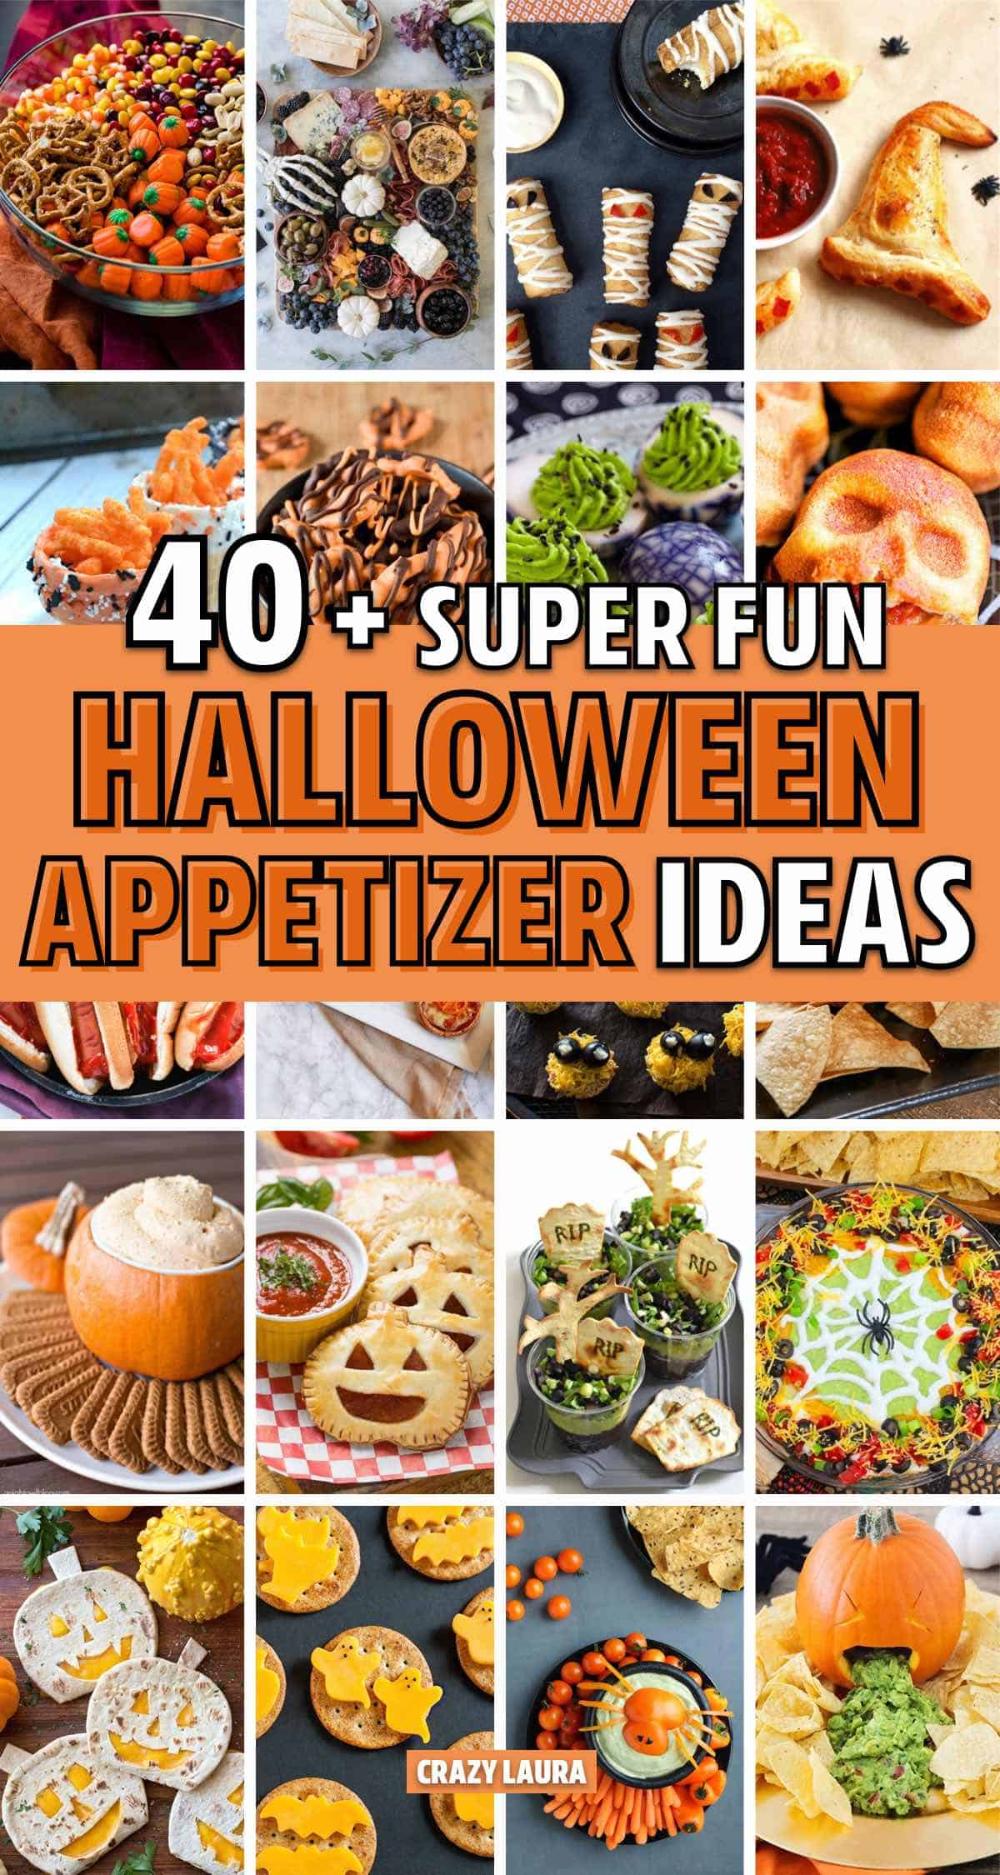 Halloween Appetizers 2020 40+ Best Halloween Appetizer & Snack Ideas For 2020   Halloween